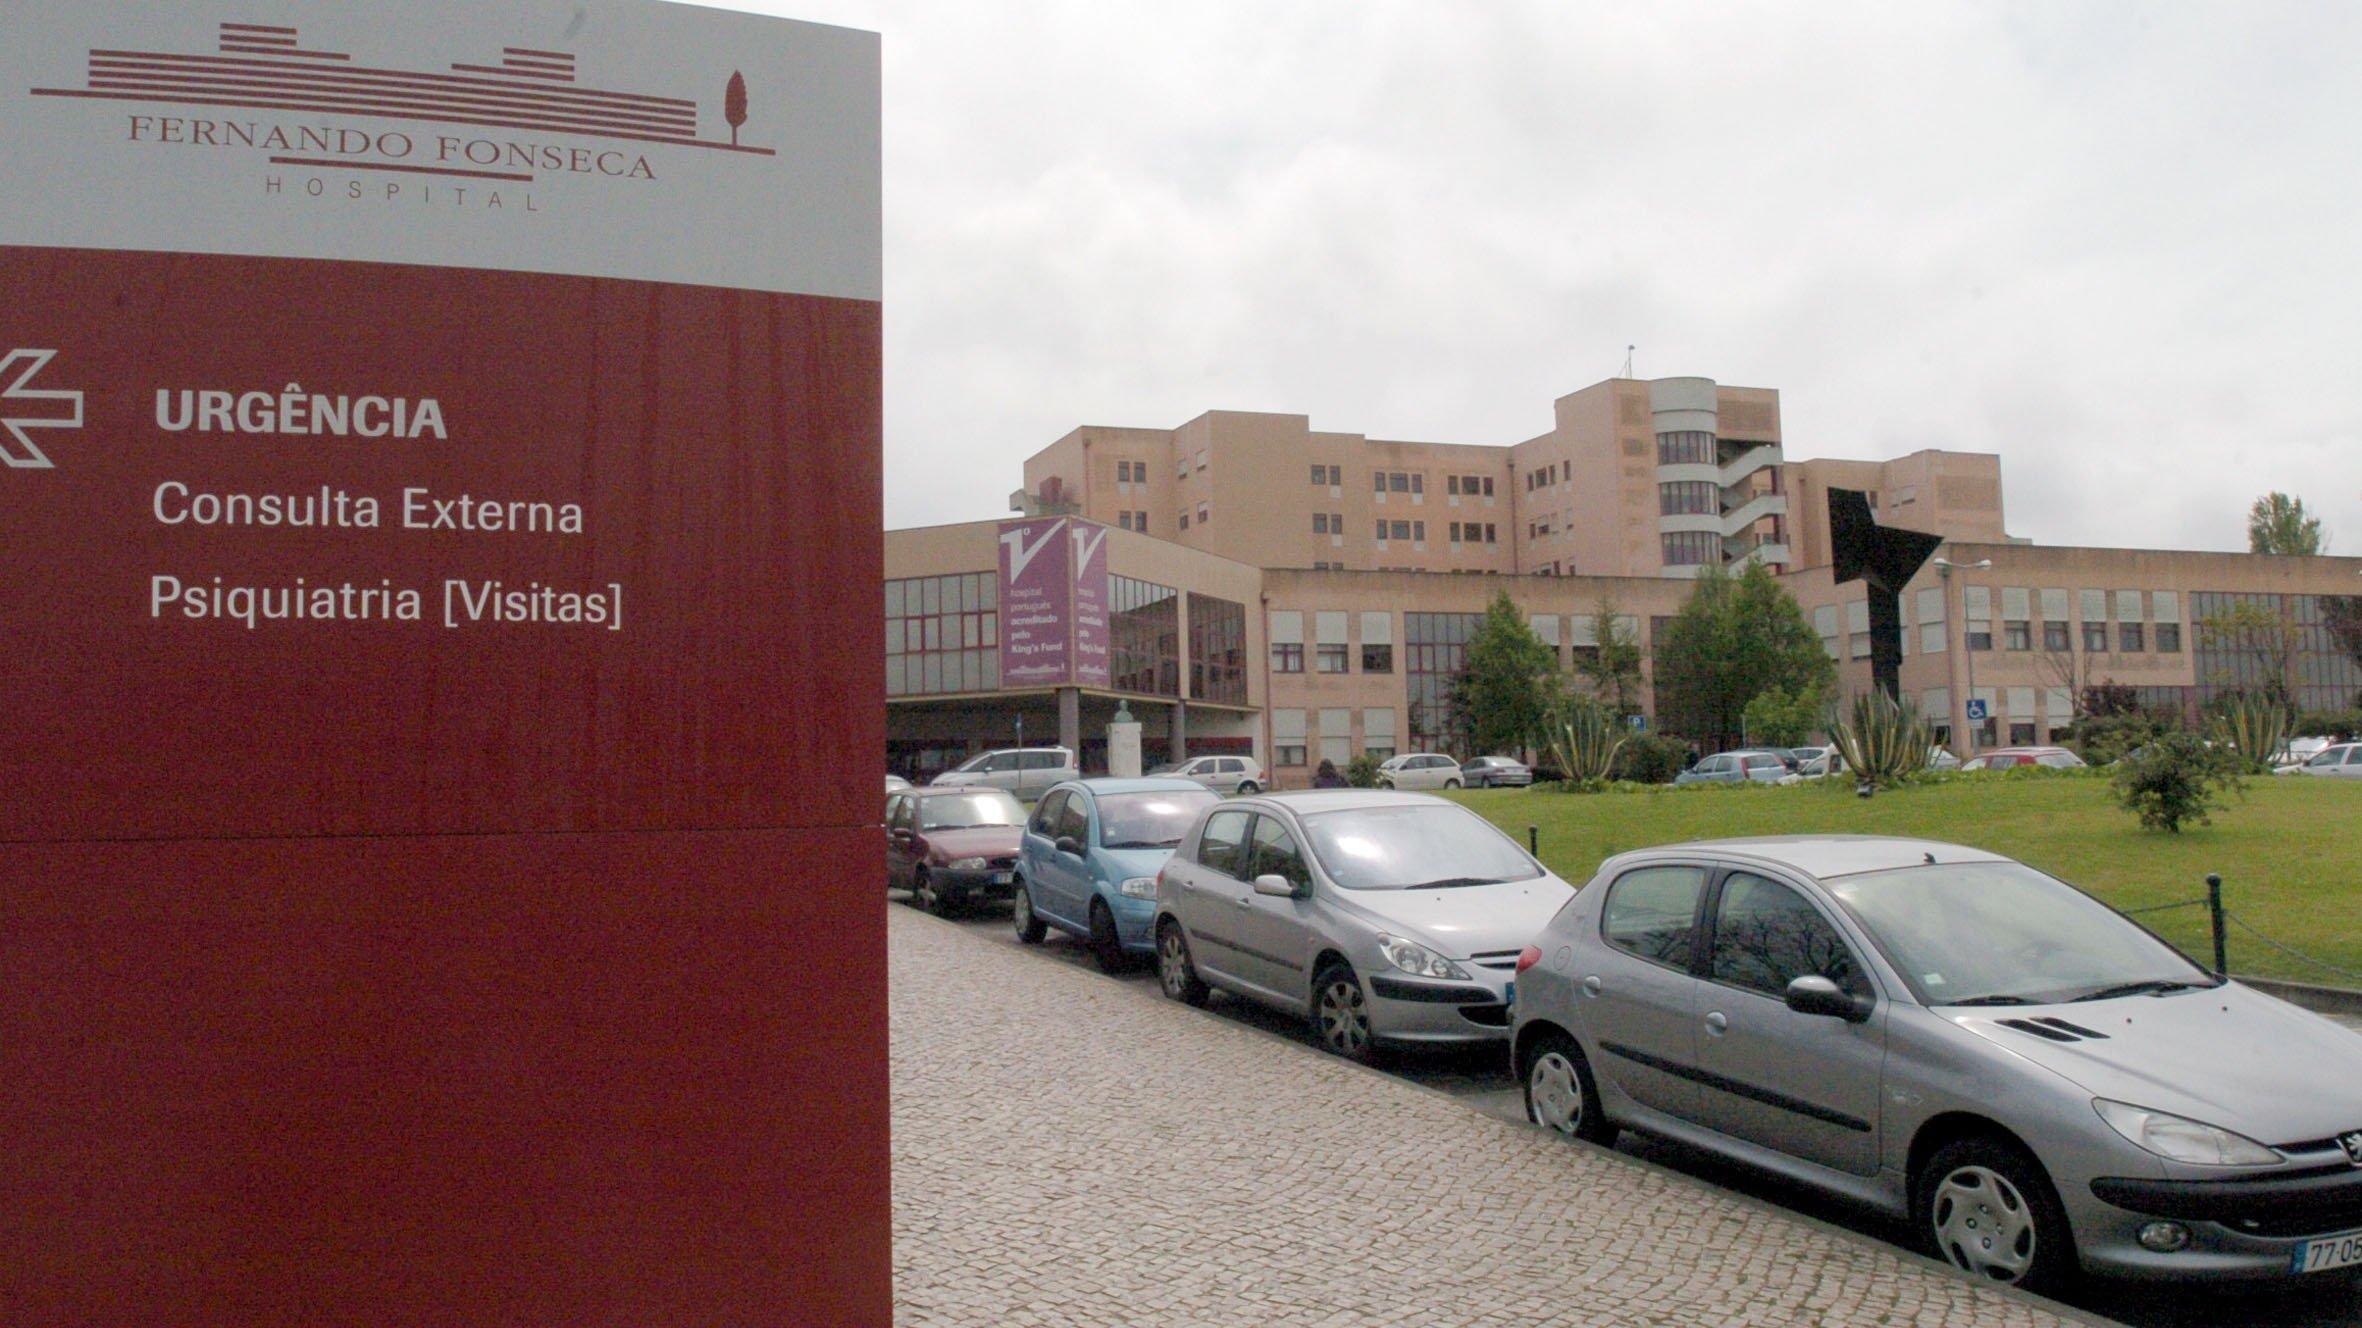 Hospital Fernando Fonseca (Amadora/Sintra)